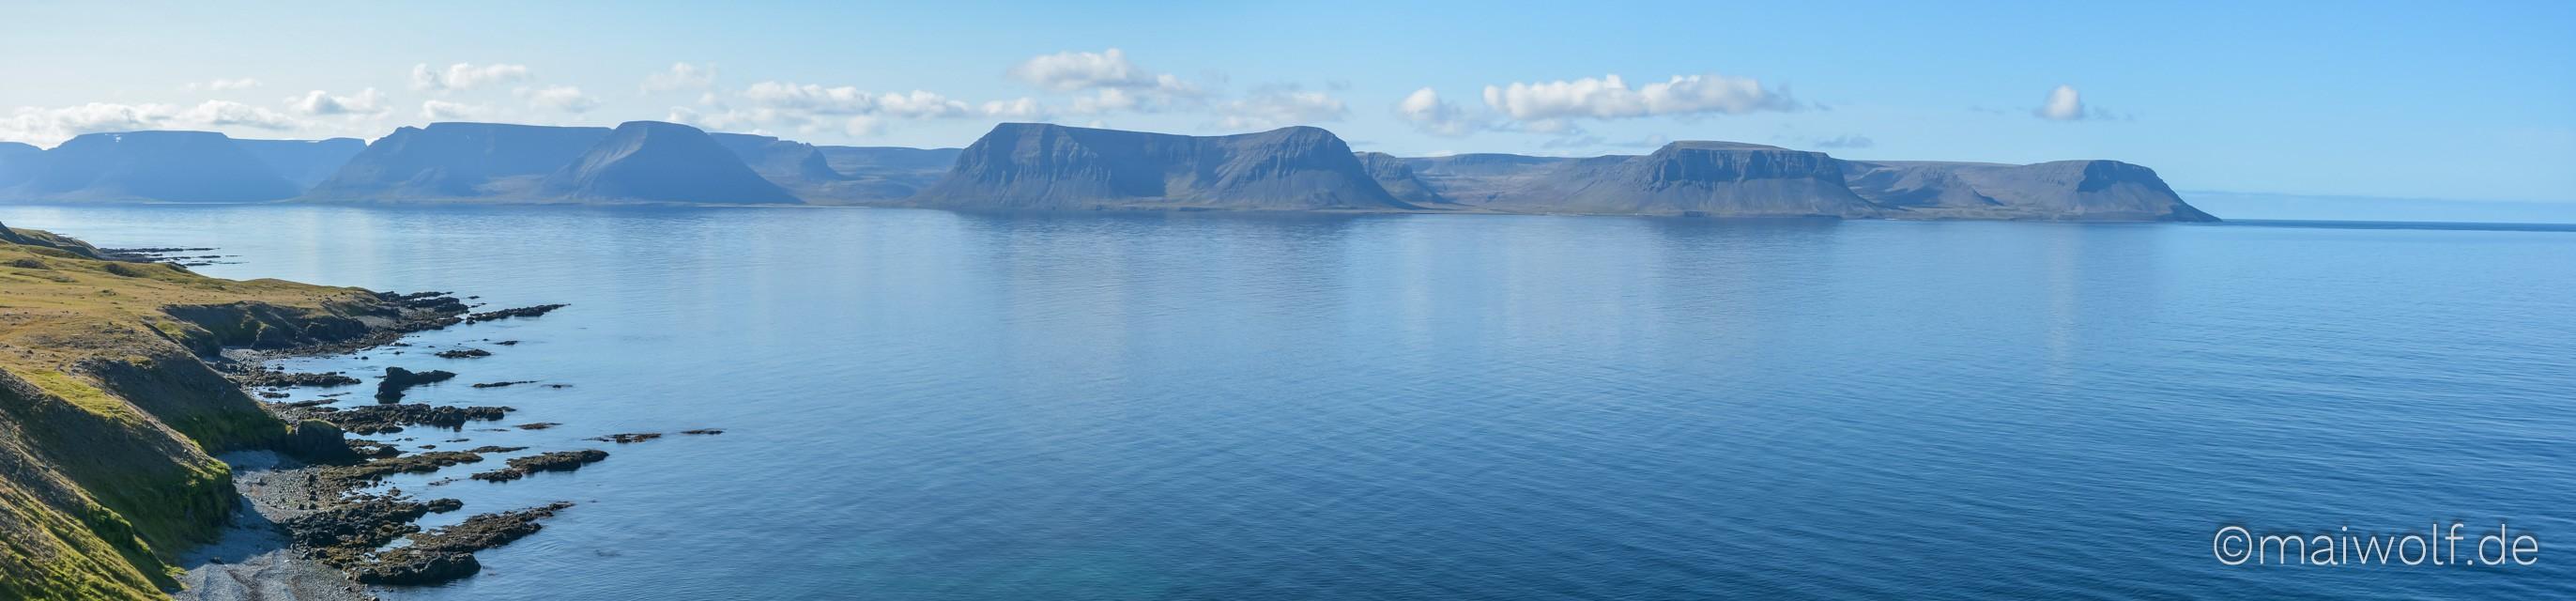 Island pano 019 https://blog.maiwolf.de/island_westfjorde/